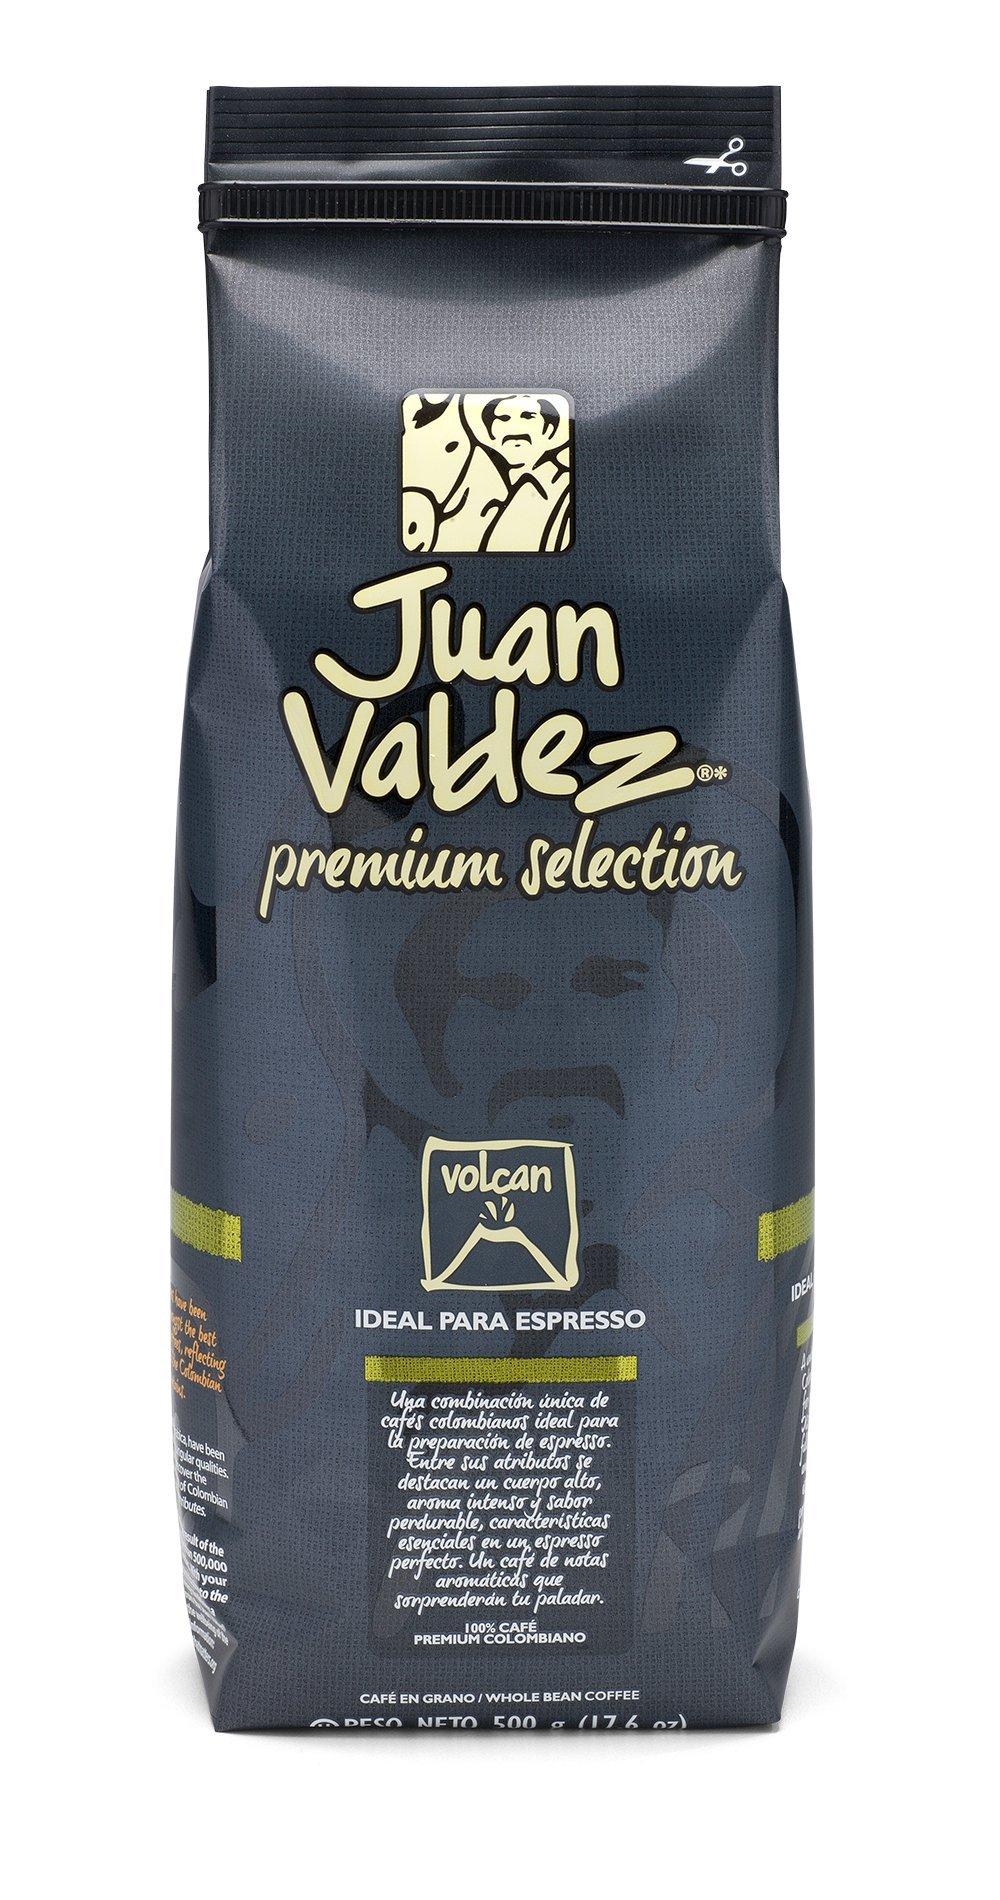 Juan Valdez Premium Strong Colombian coffee, Volcan Whole Bean, 17.6 oz